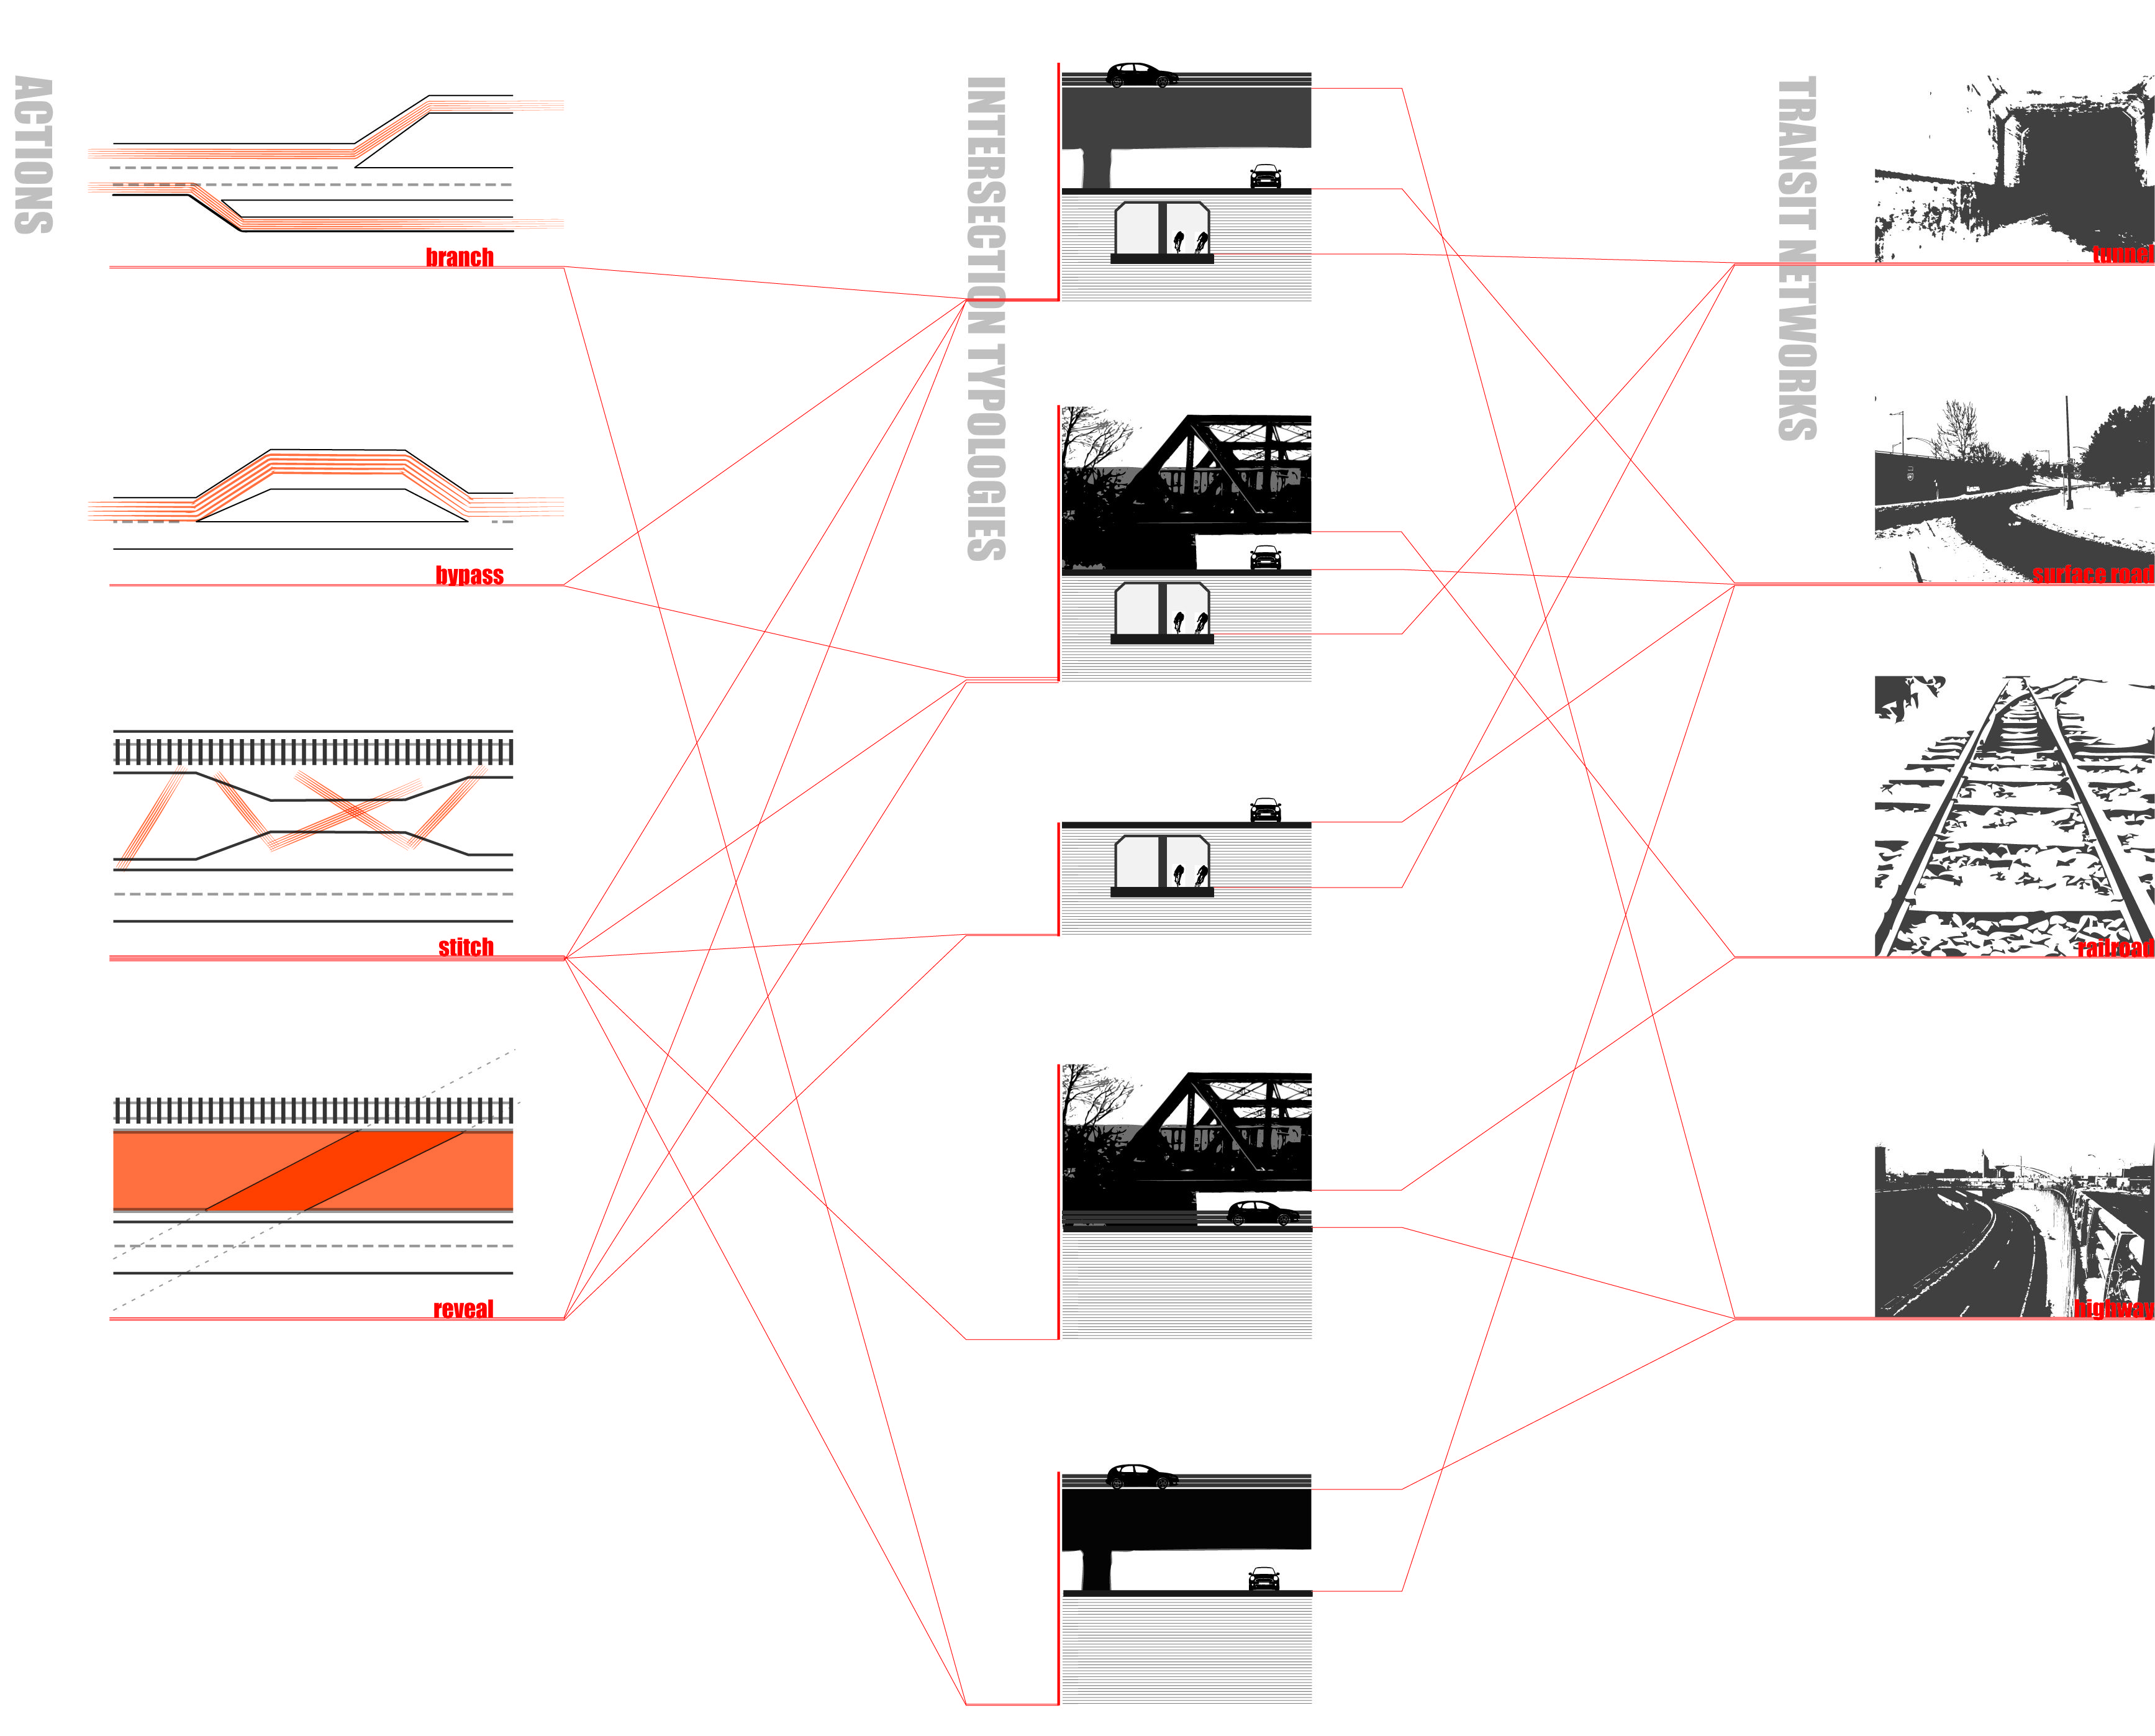 oma parc de la villette diagram 1995 evinrude 115 wiring diagrams google search pinterest